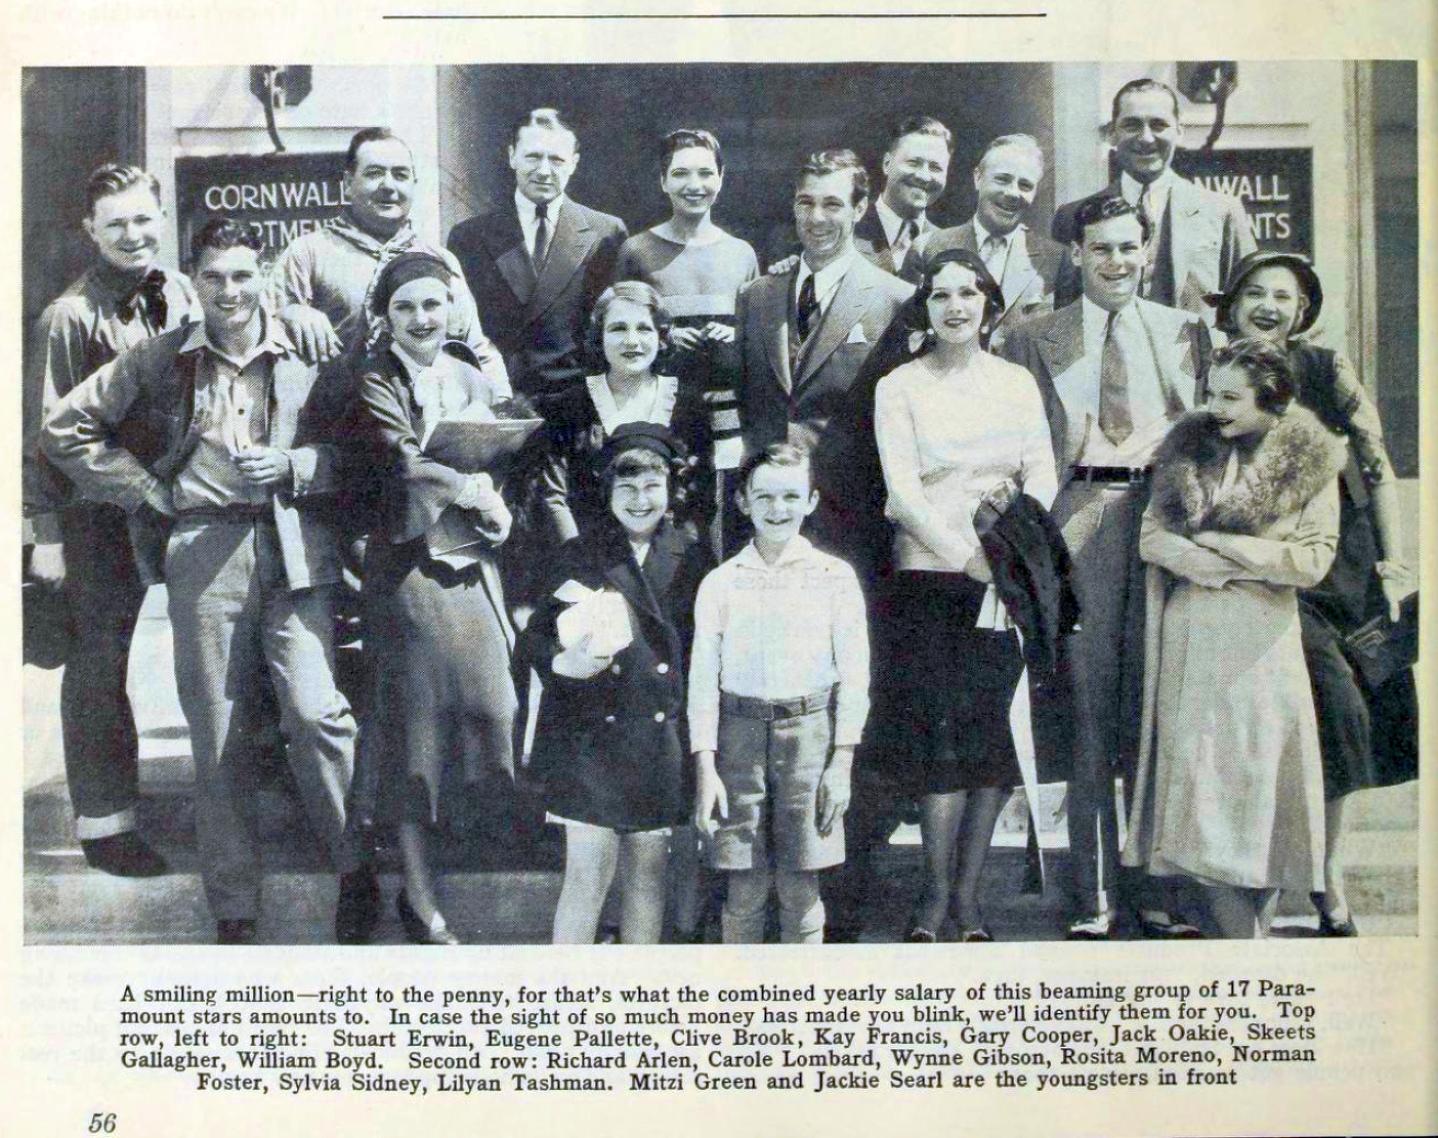 carole lombard photoplay july 1931 paramount group portrait large